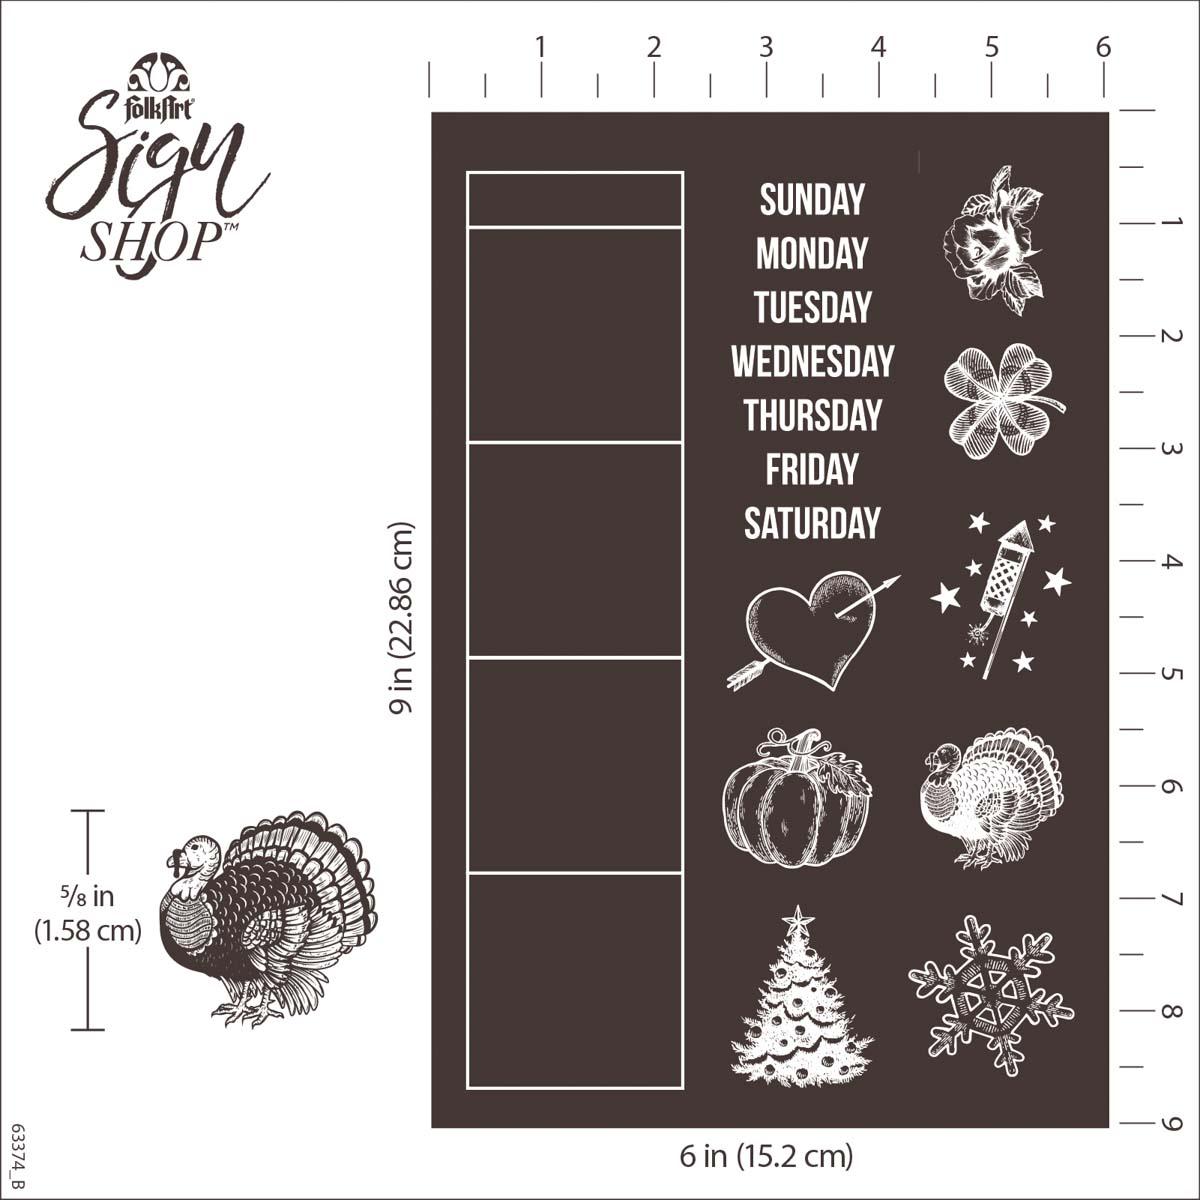 FolkArt ® Sign Shop™ Mesh Stencil - Calendar, 2 pc. - 63374